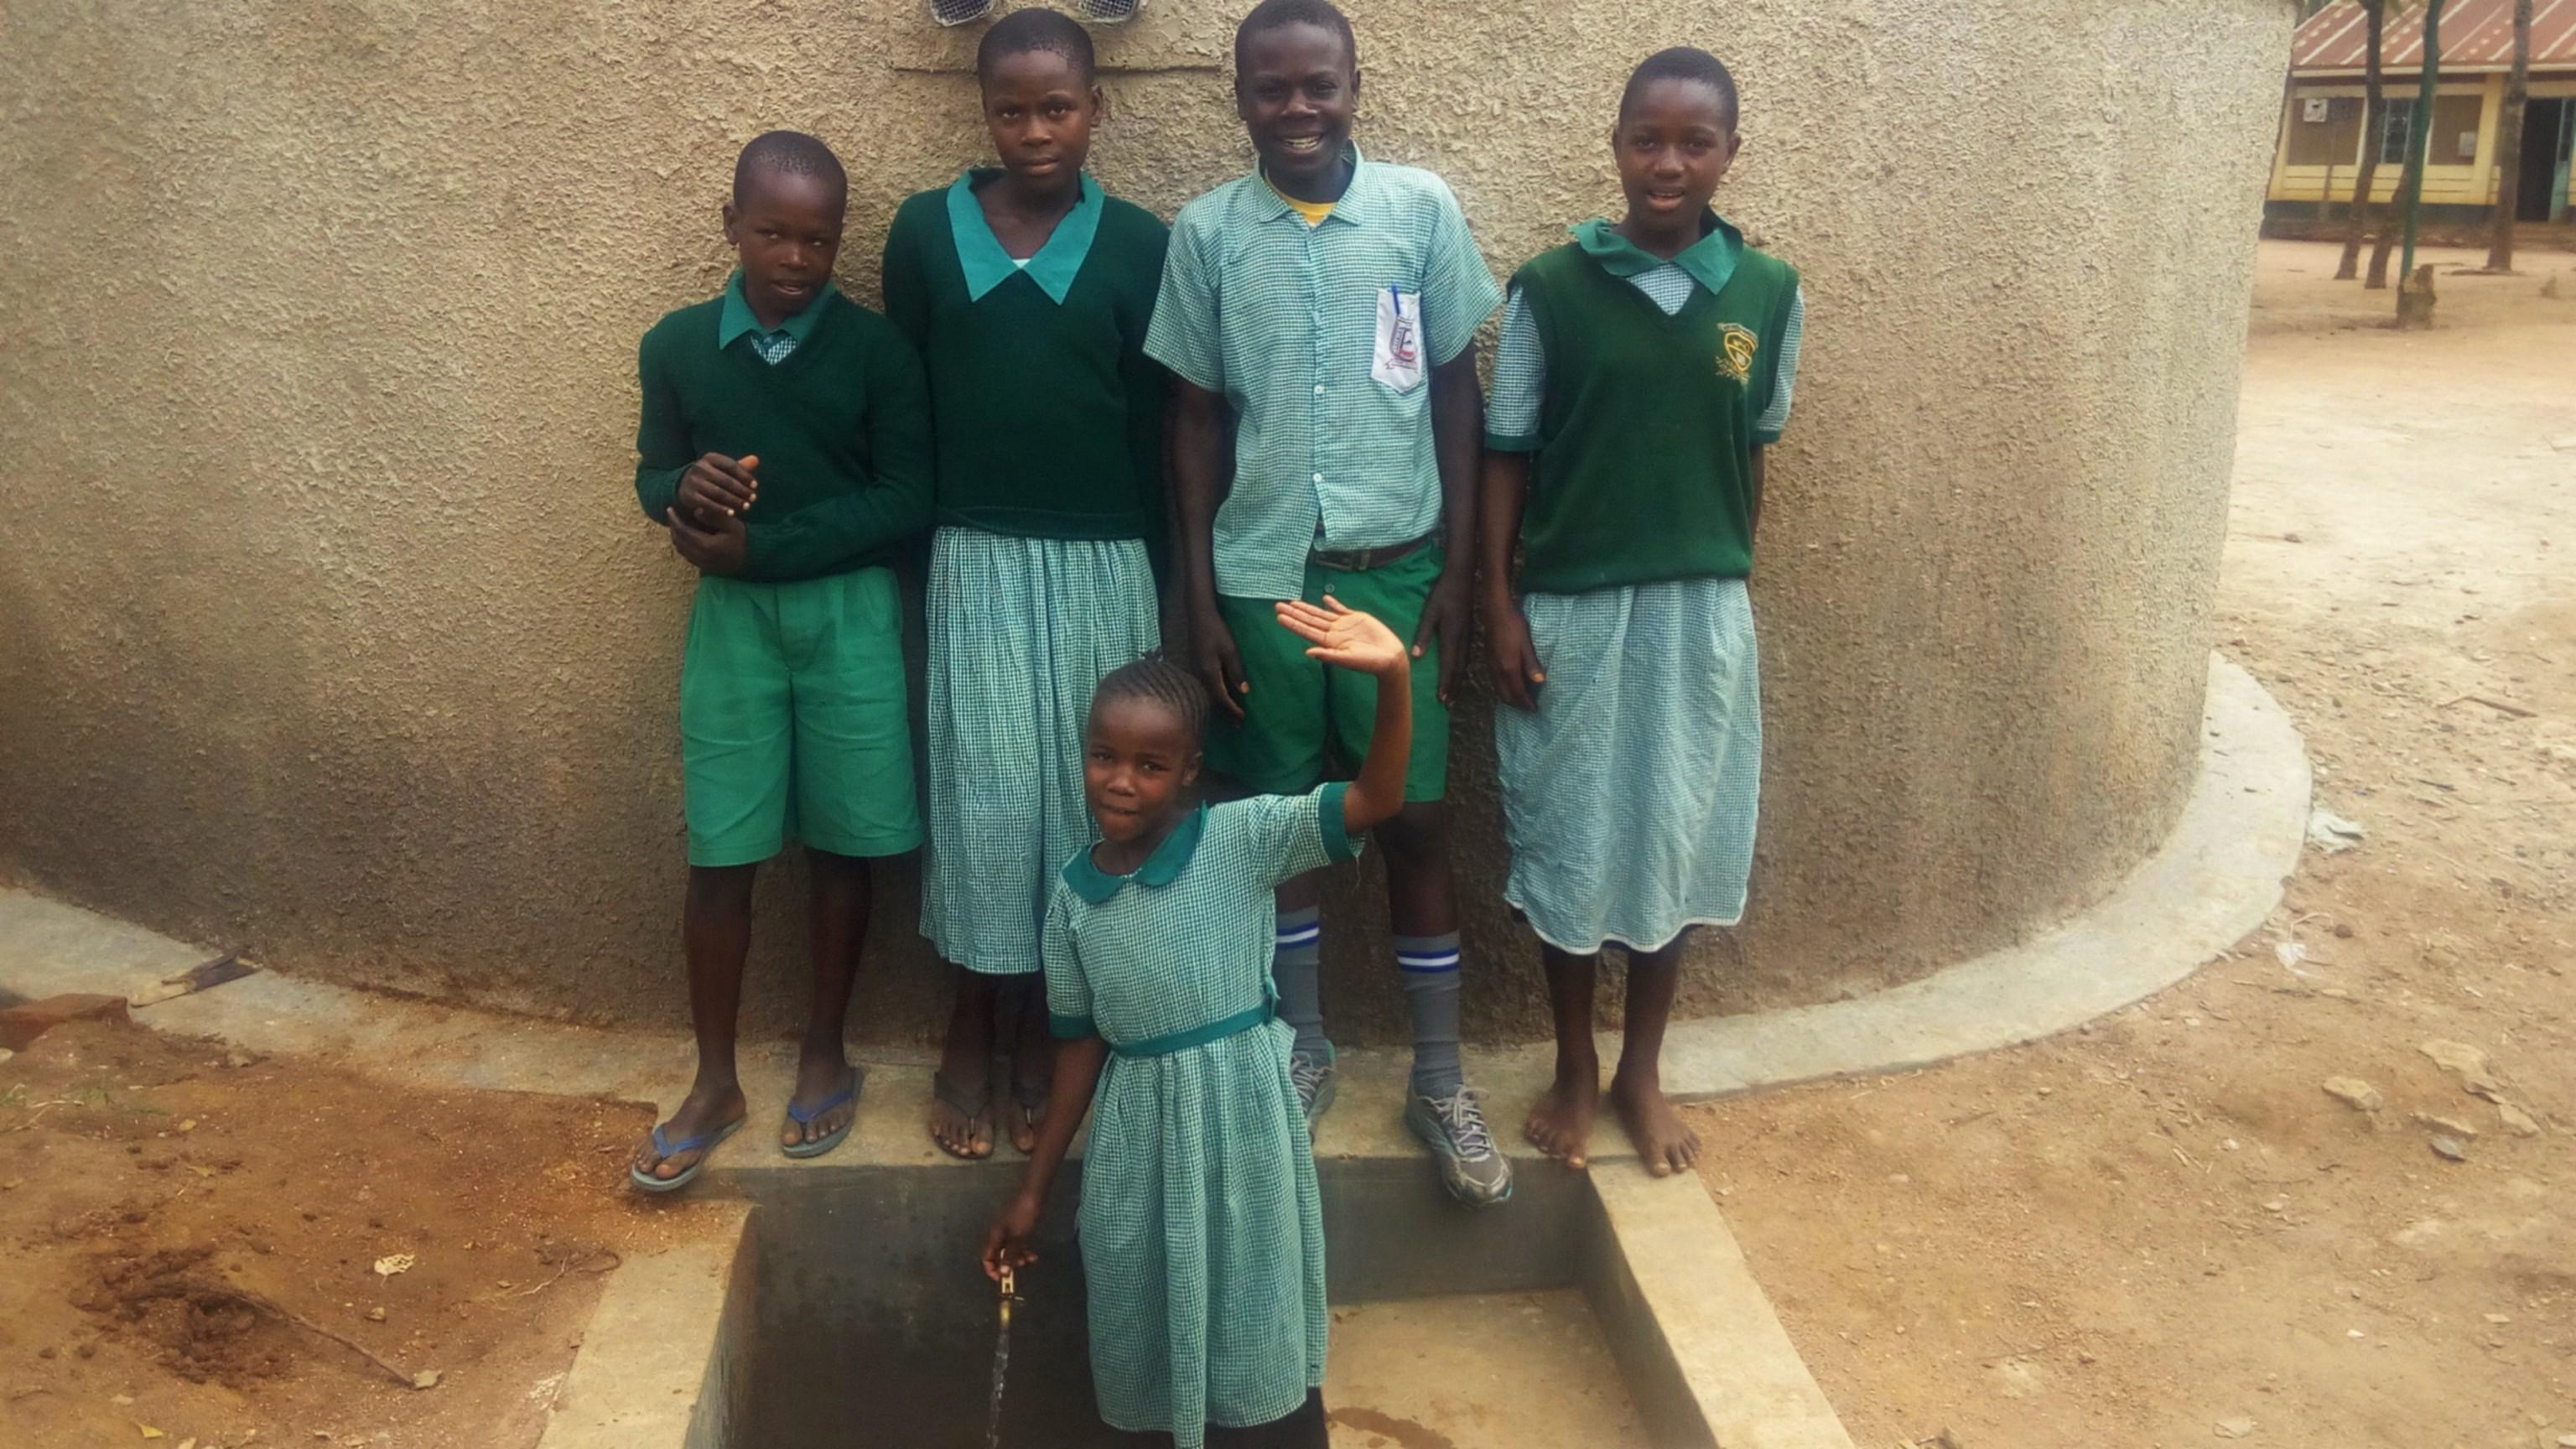 Eshilakwe Primary School